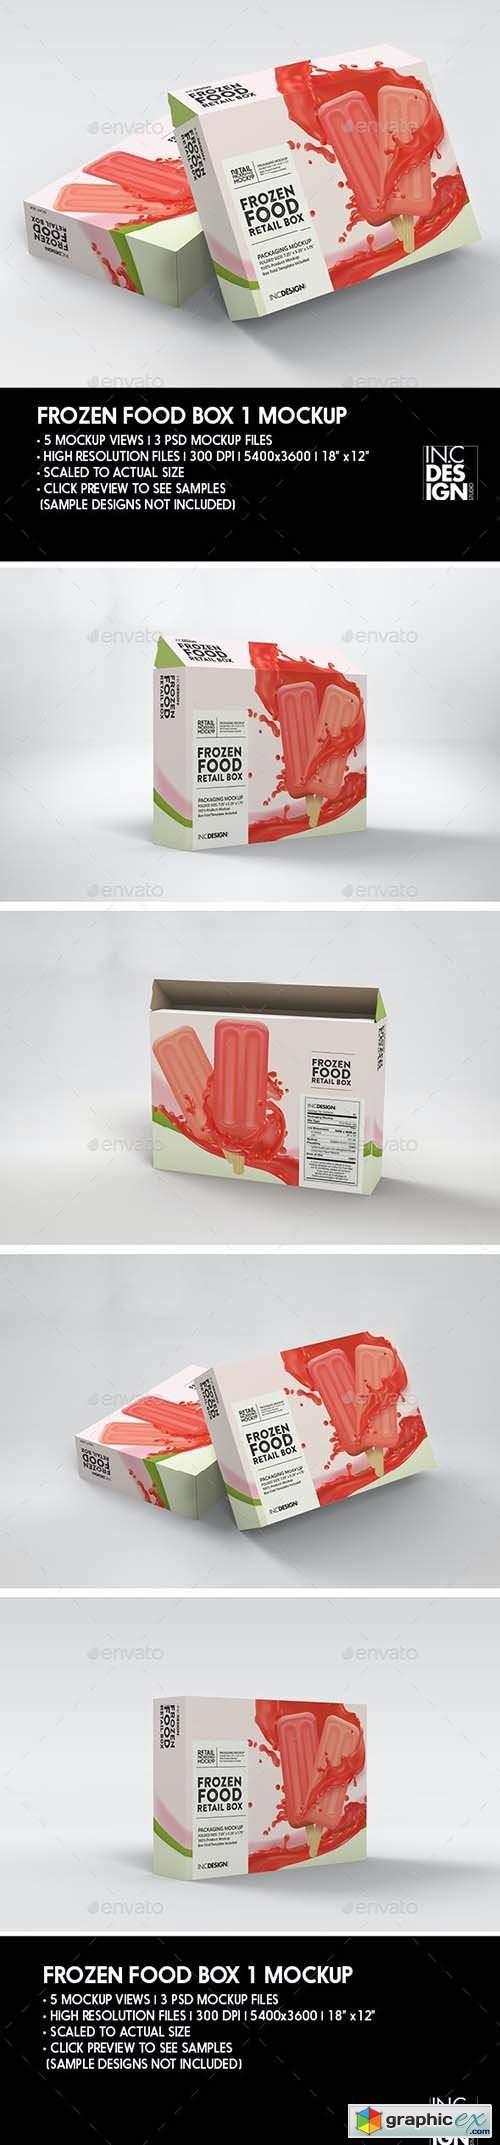 Thin Frozen Food Box Packaging Mockup